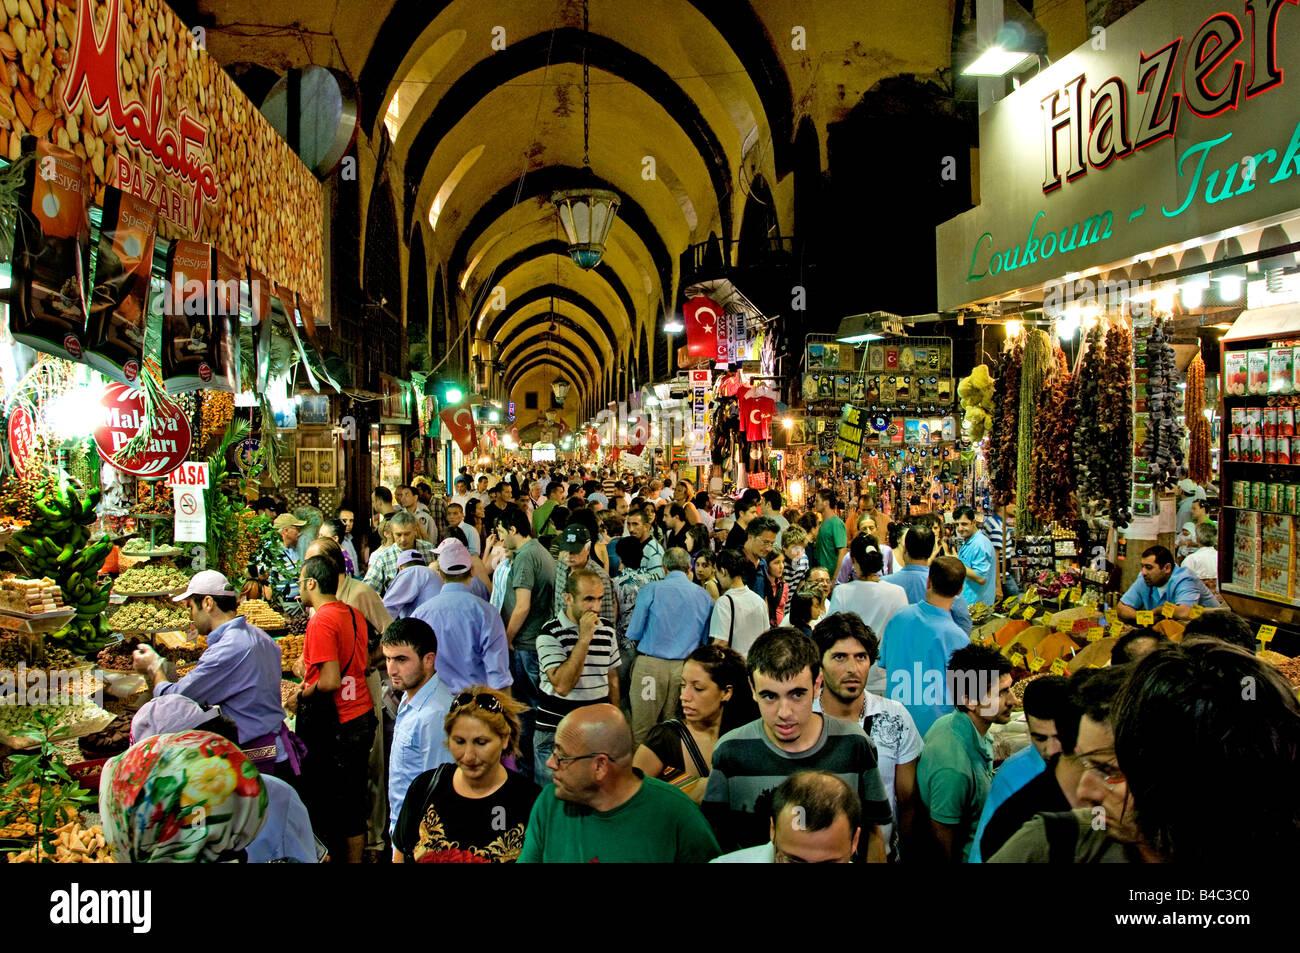 Egyptian Spice Bazaar Istanbul Turkey - Stock Image